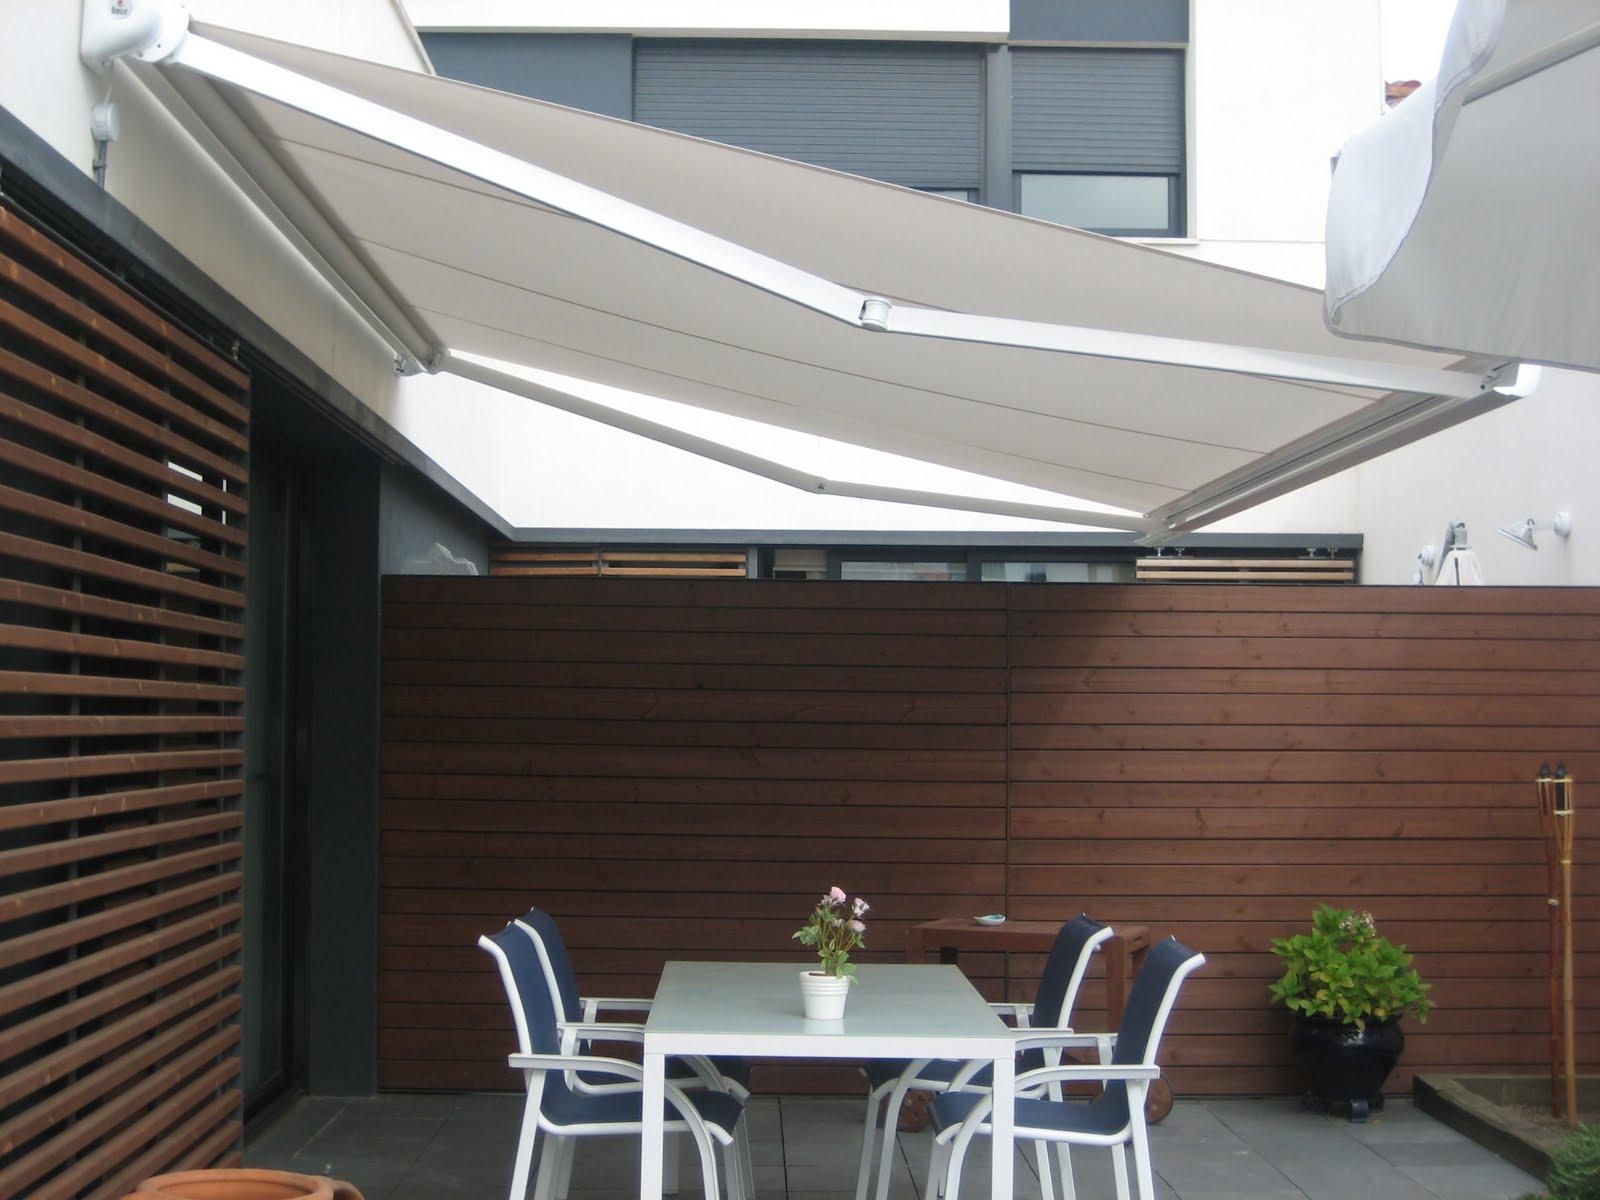 Ideas aladro i puig toldo cofre llaza motorizado - Tipos de toldos para patios ...